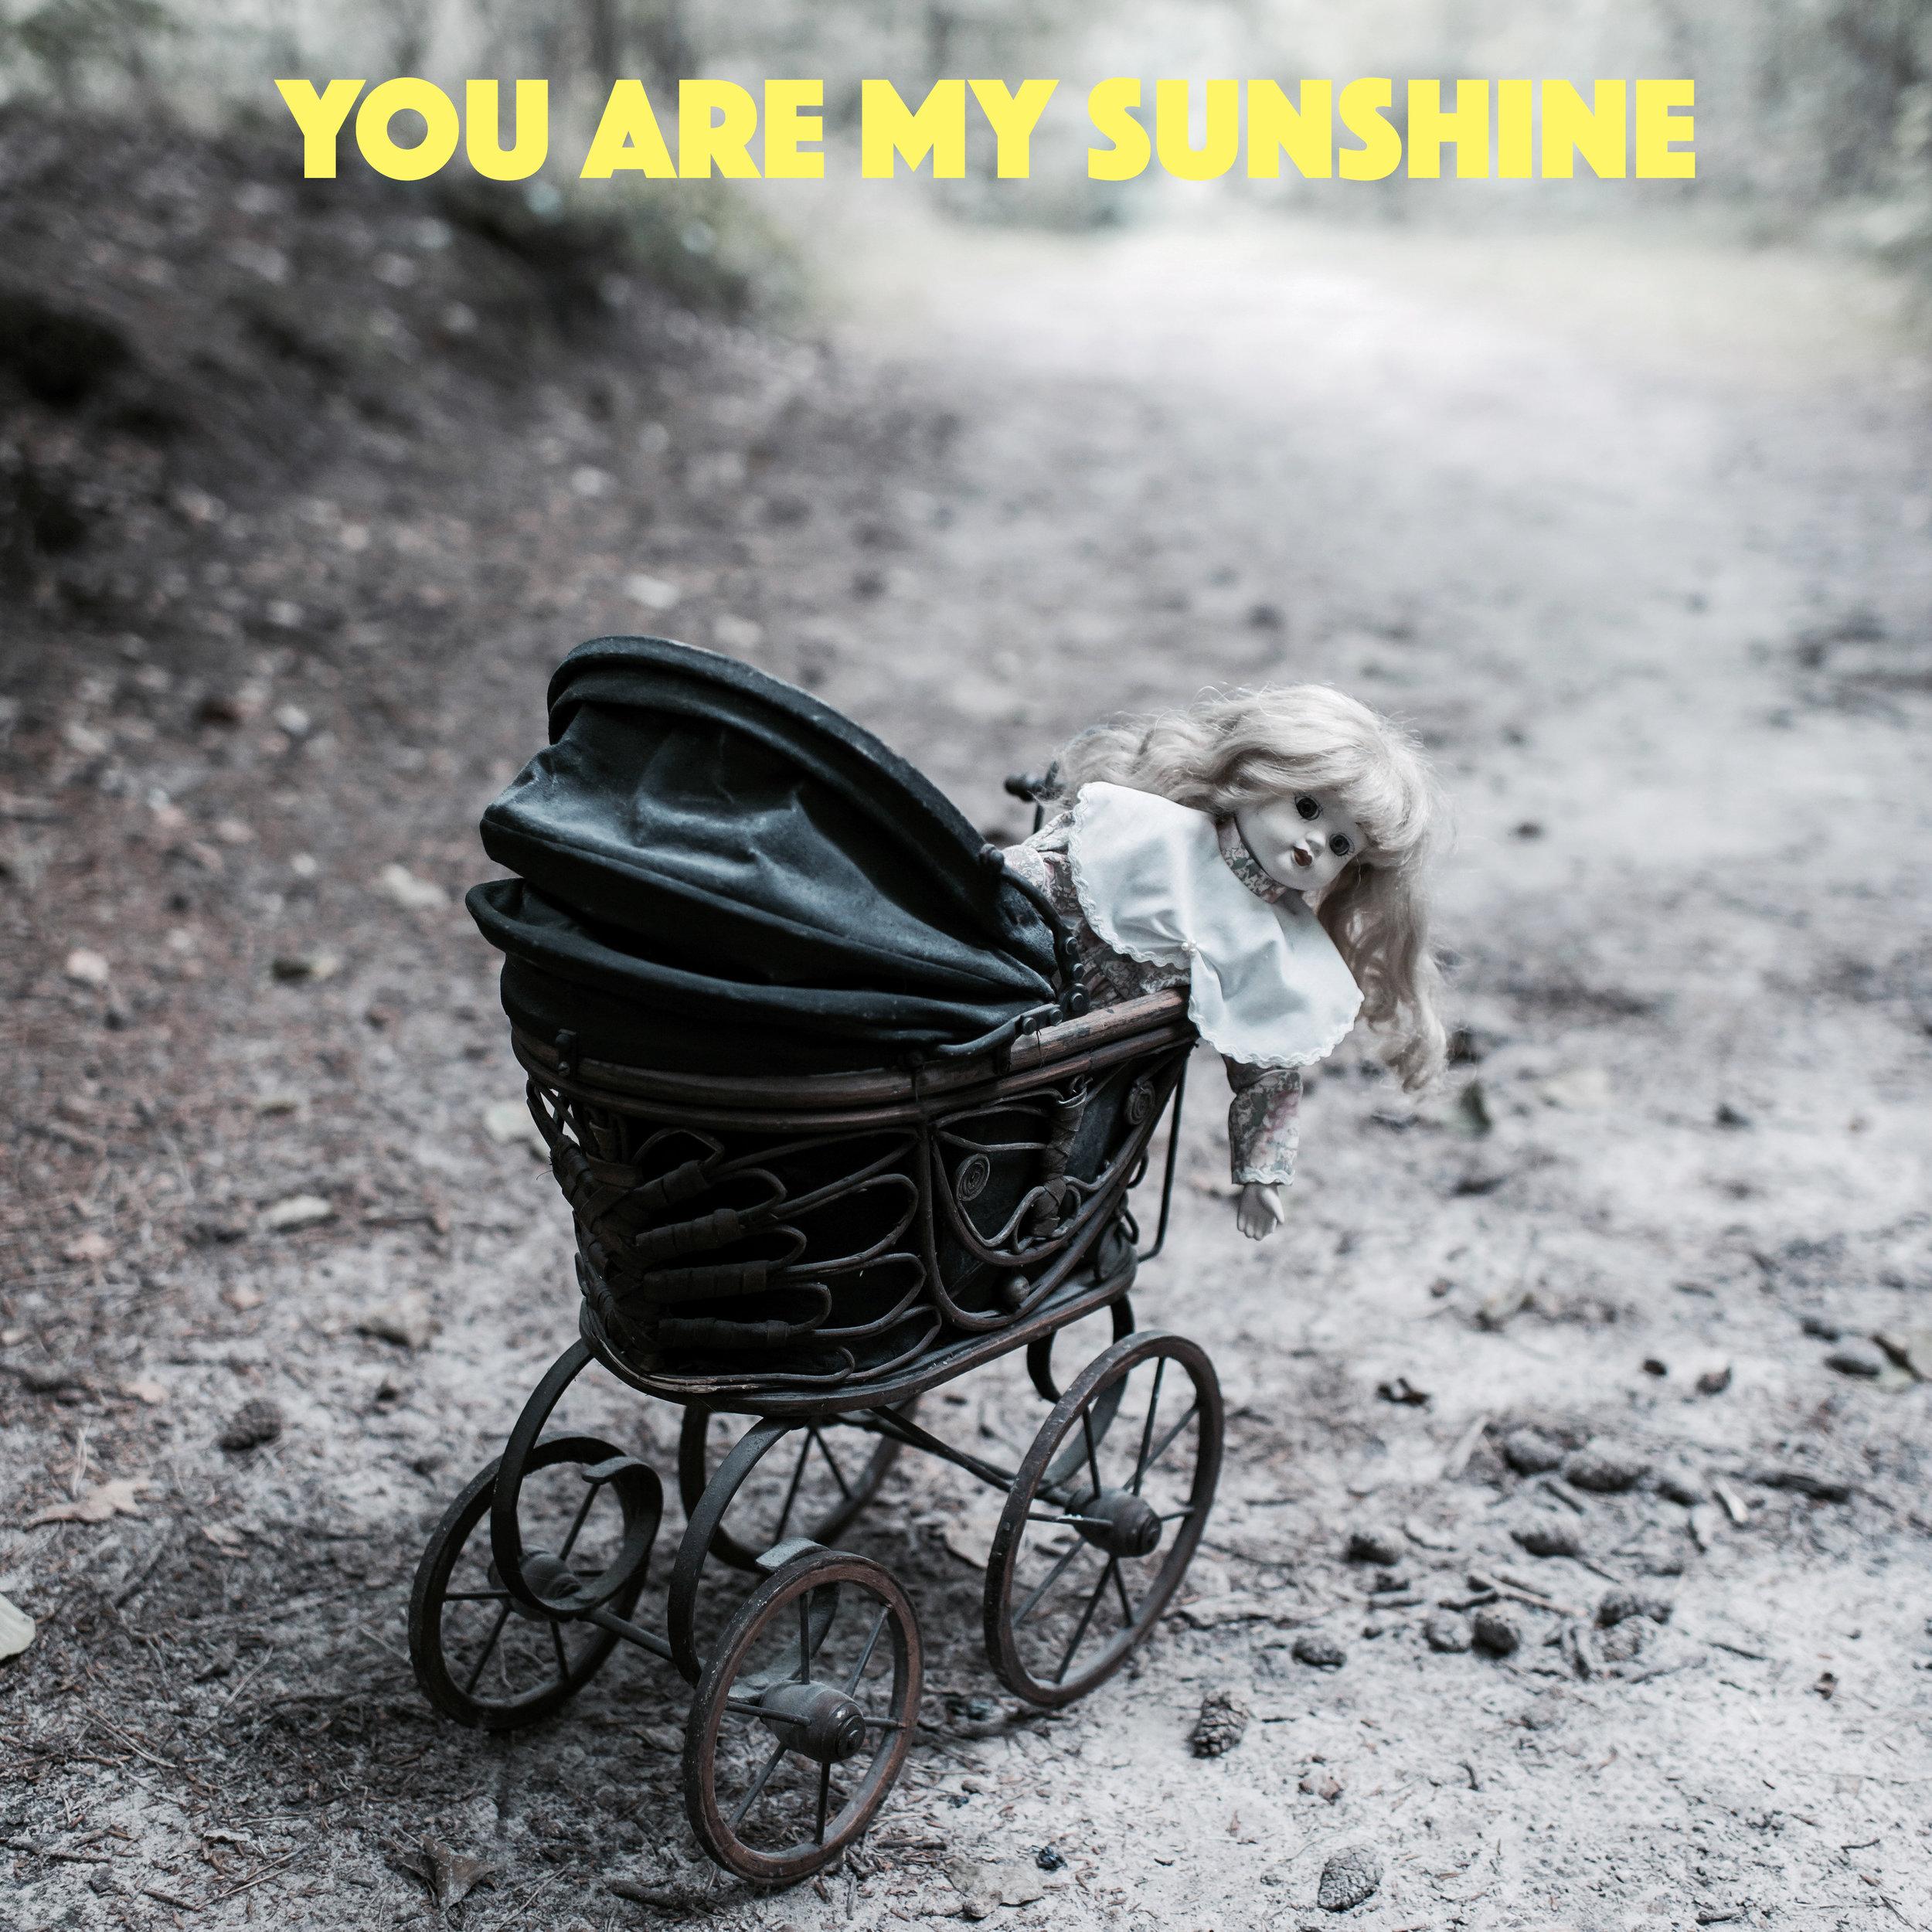 Sadie-Trigg-'You-Are-My-Sunshine'-20-Feb-18-Revision.jpg